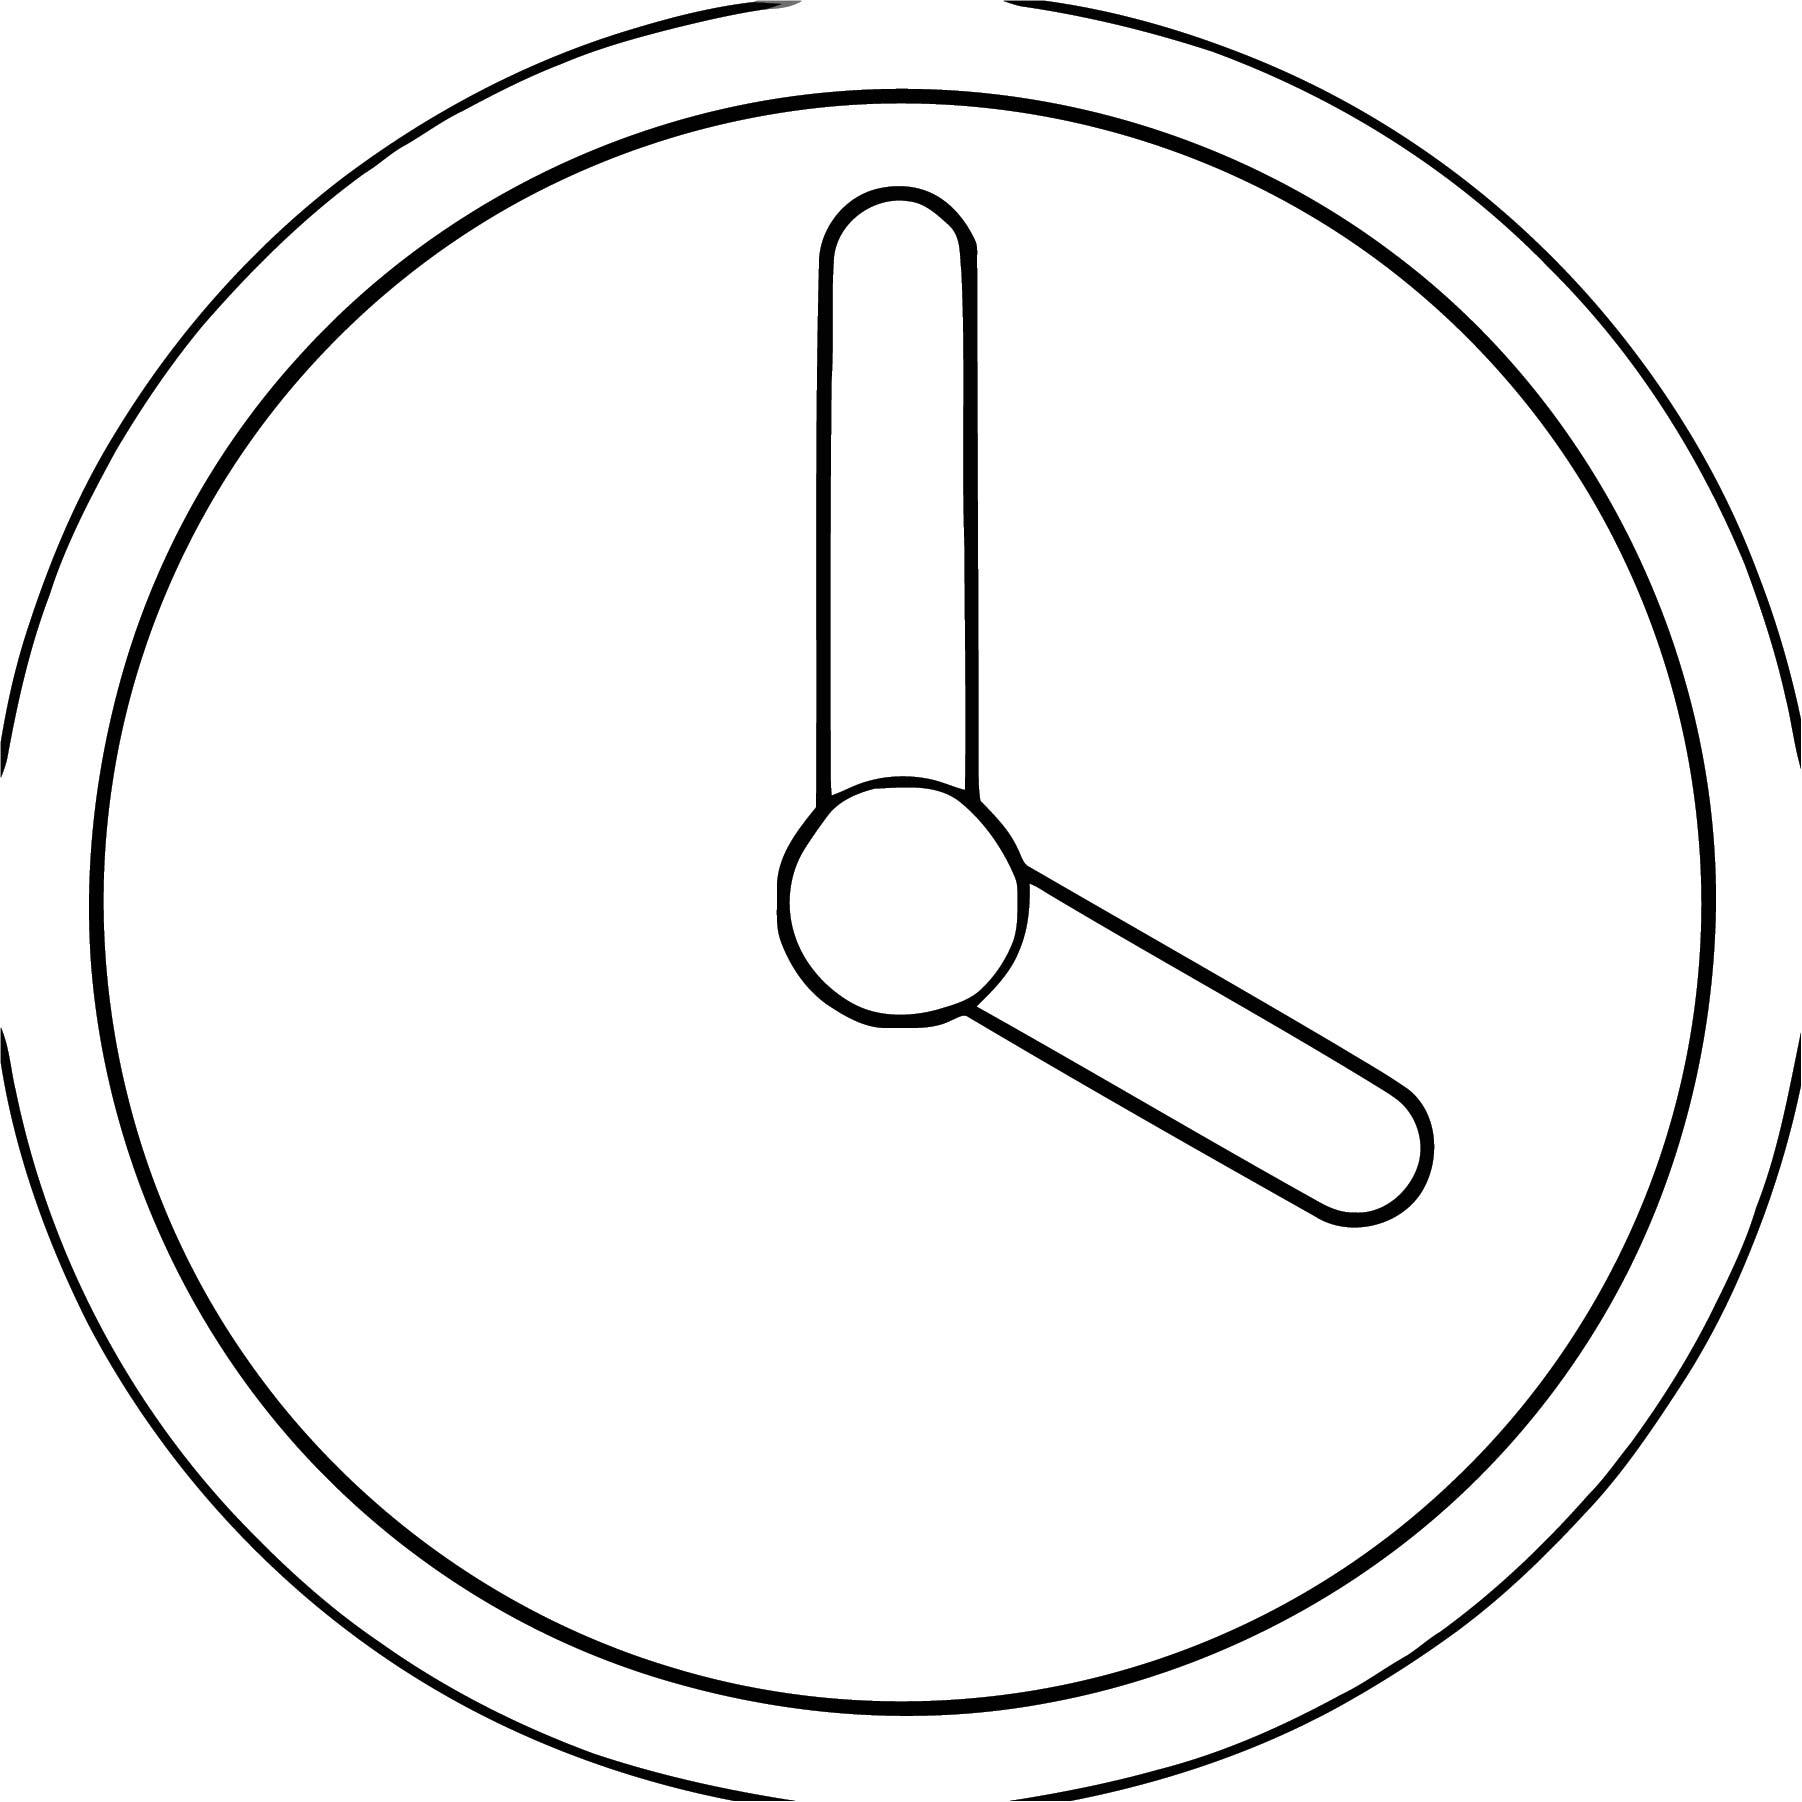 1843 Clock Desi Free Printable Gn Cartoonized Free Printable Coloring Page